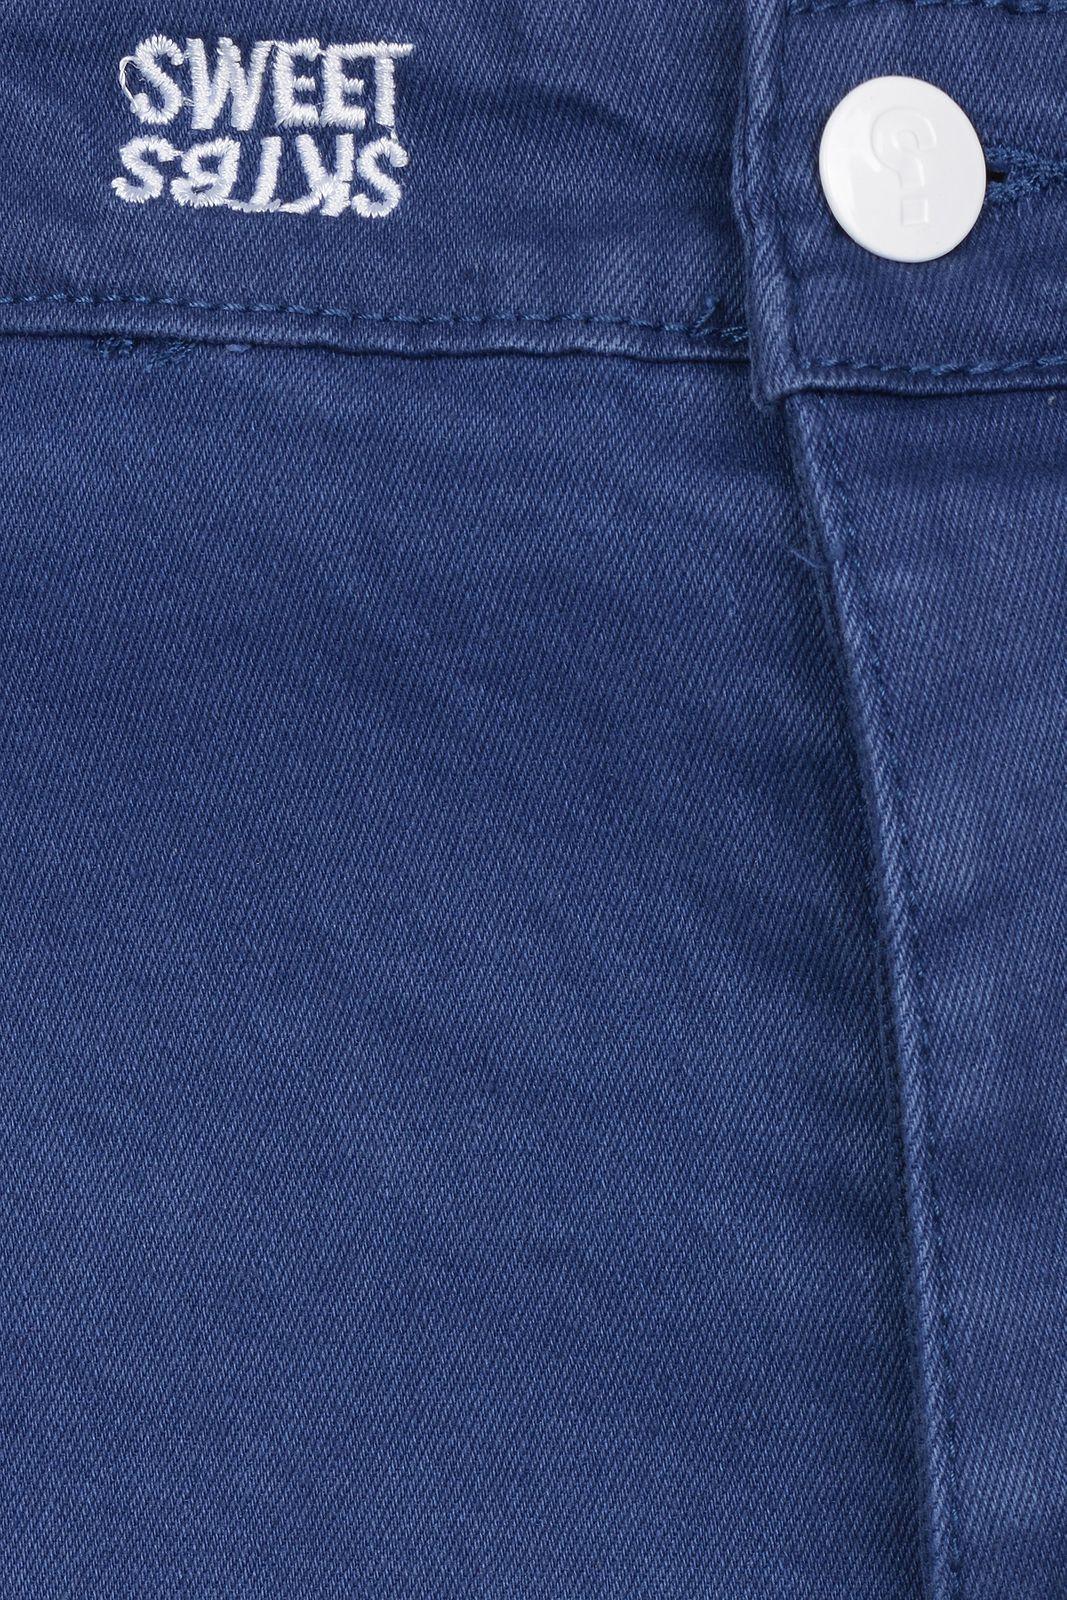 Hose Herren Shorts Chinoshorts Jeansshorts kurze Hose Sweet SKTBS ... af2999e855